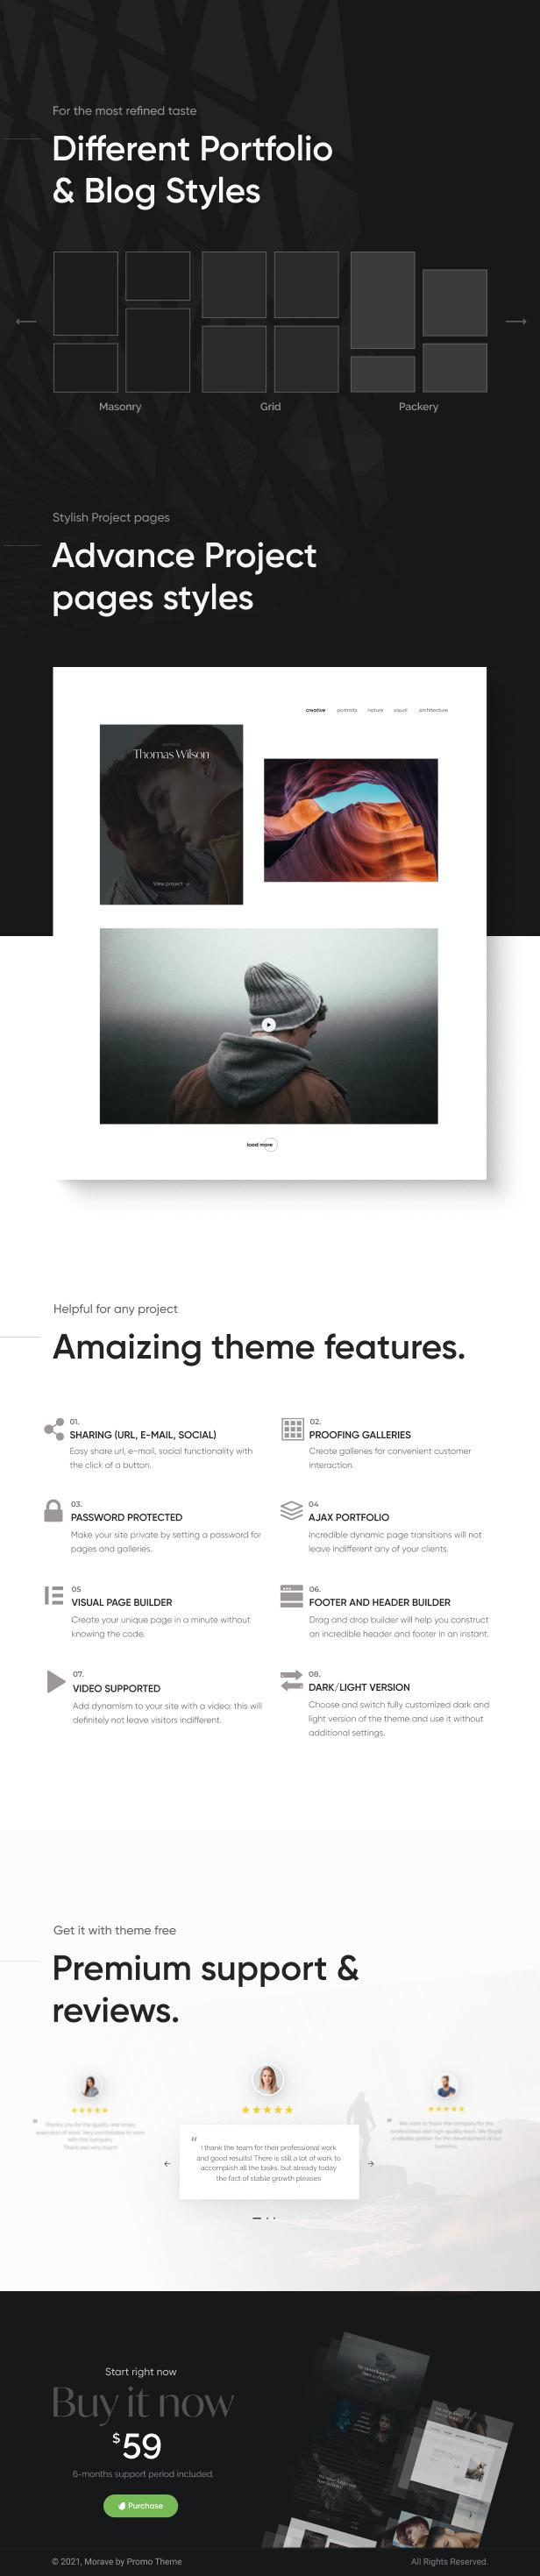 Morave - AJAX Portfolio WordPress Theme - 8